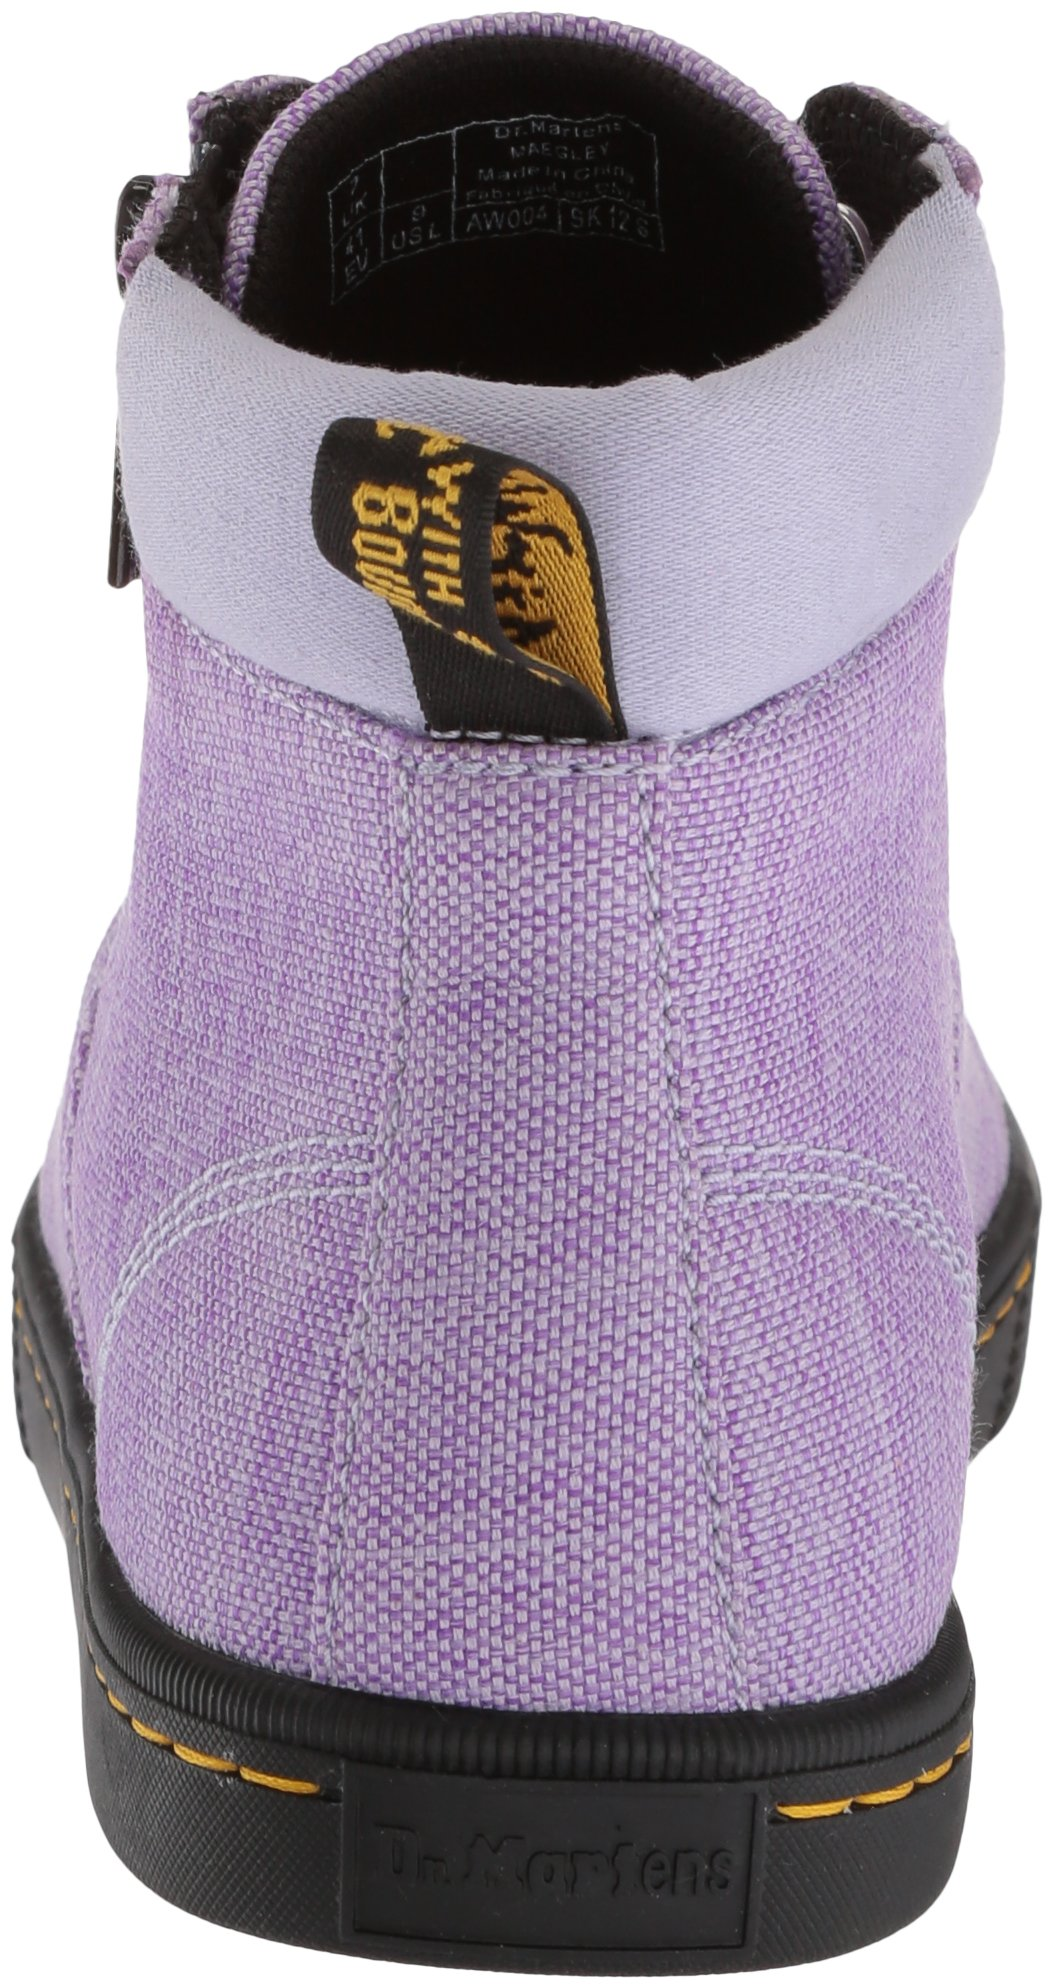 Dr. Martens Women's Maegley Fashion Boot, Purple Heather Woven Textile+Fine Canvas, 6 Medium UK (8 US) by Dr. Martens (Image #2)